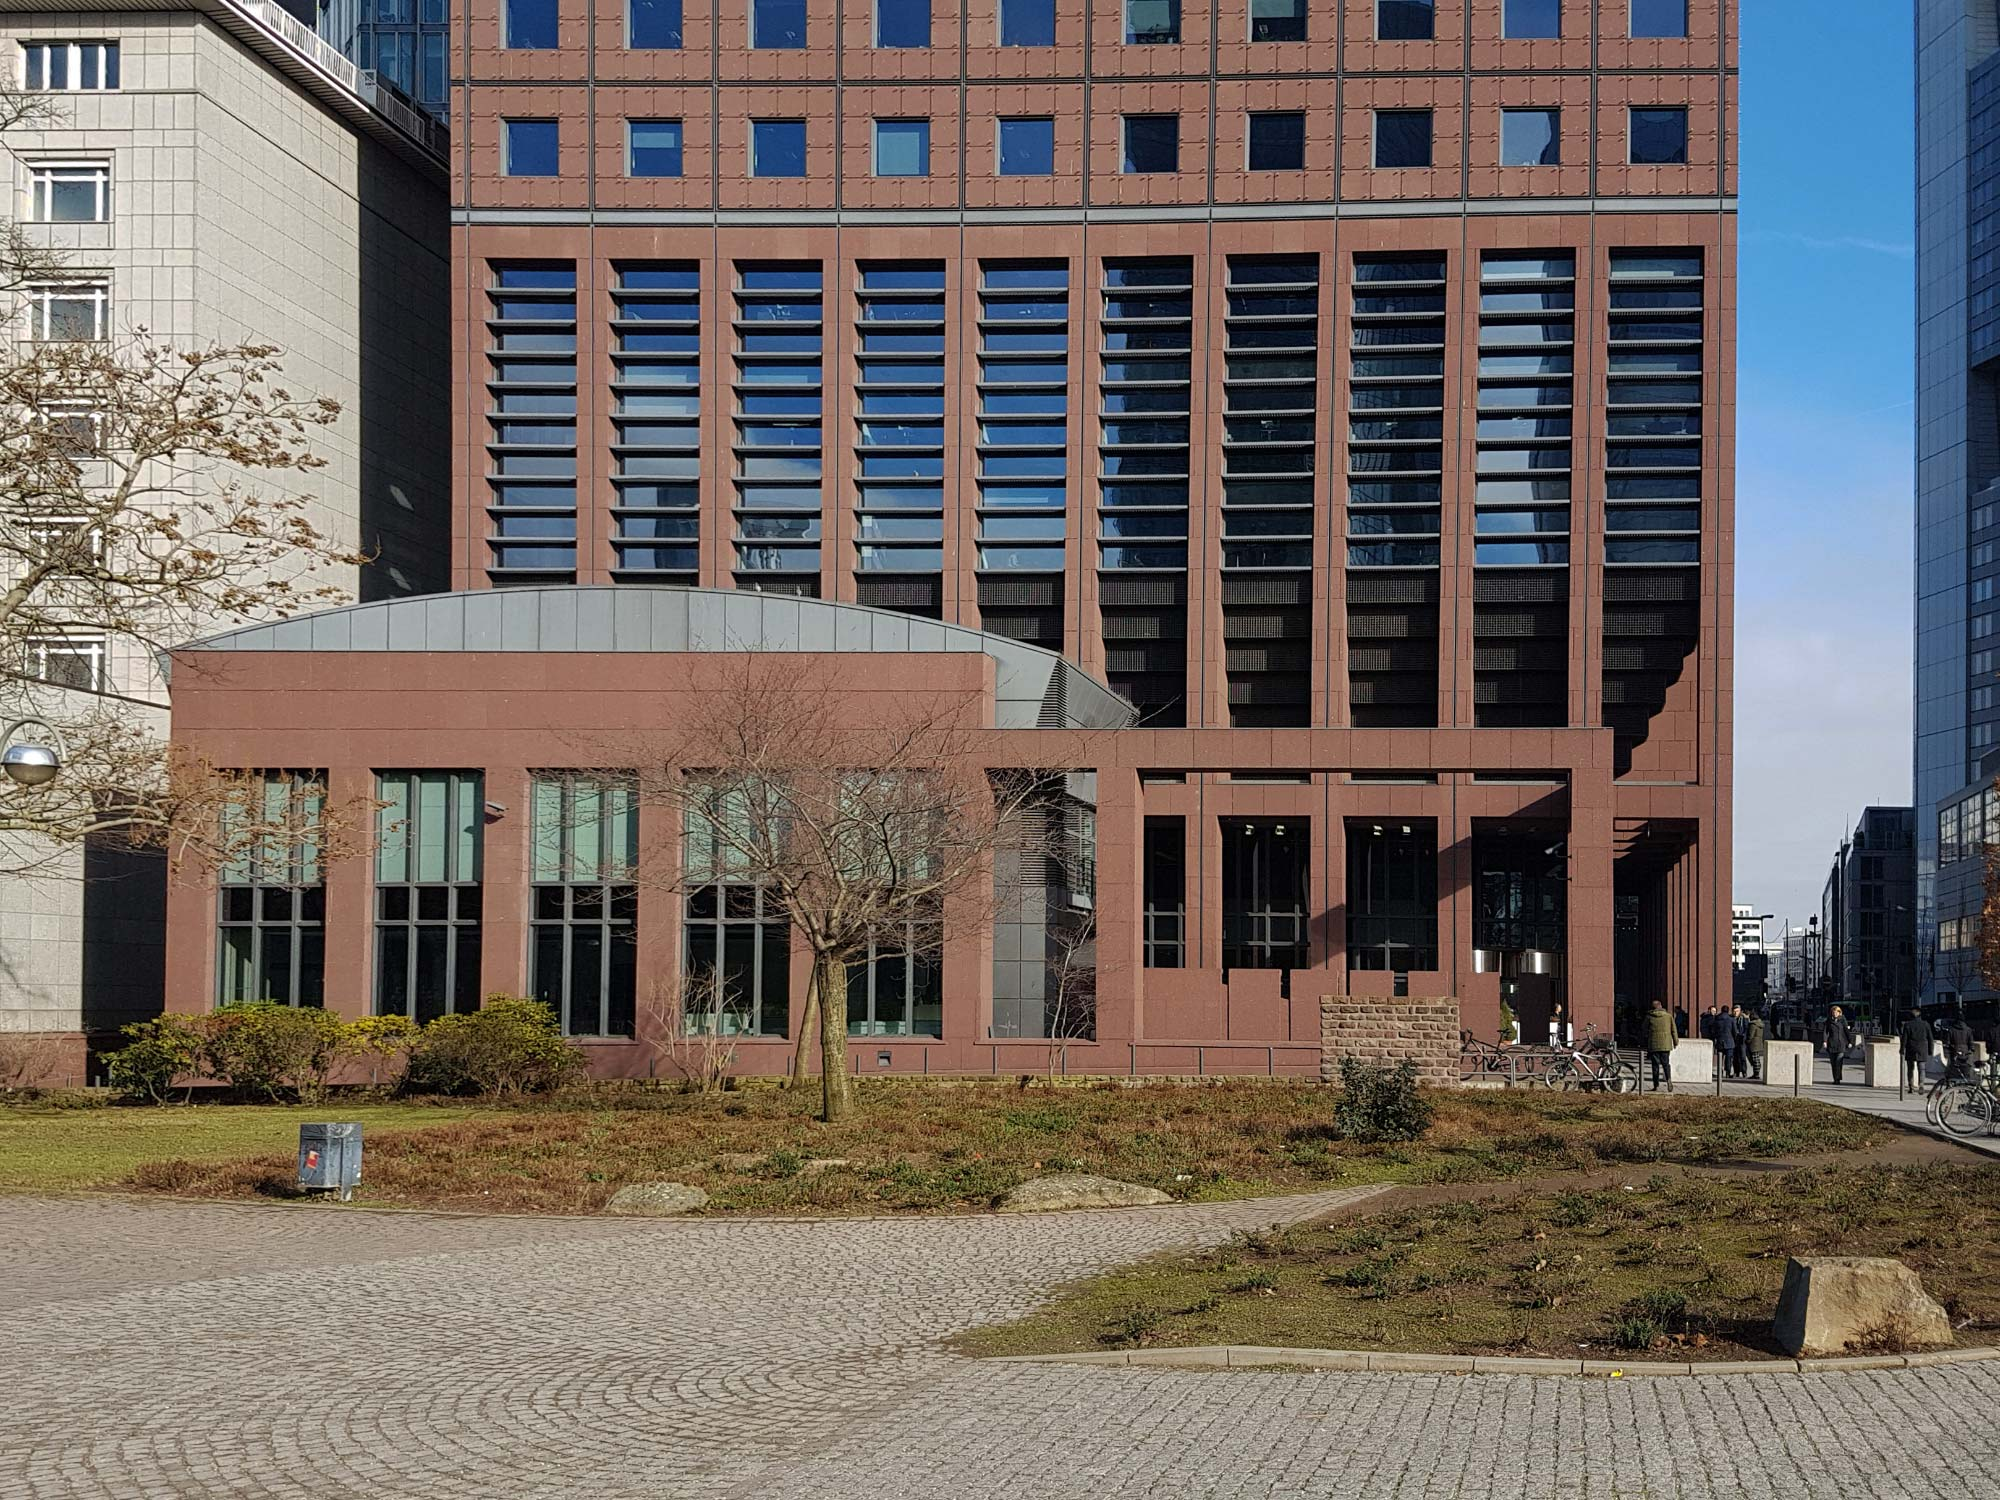 Japan Center Frankfurt am Main - Mieter EZB - Umgebung des Japan Center an der Taunusanlage